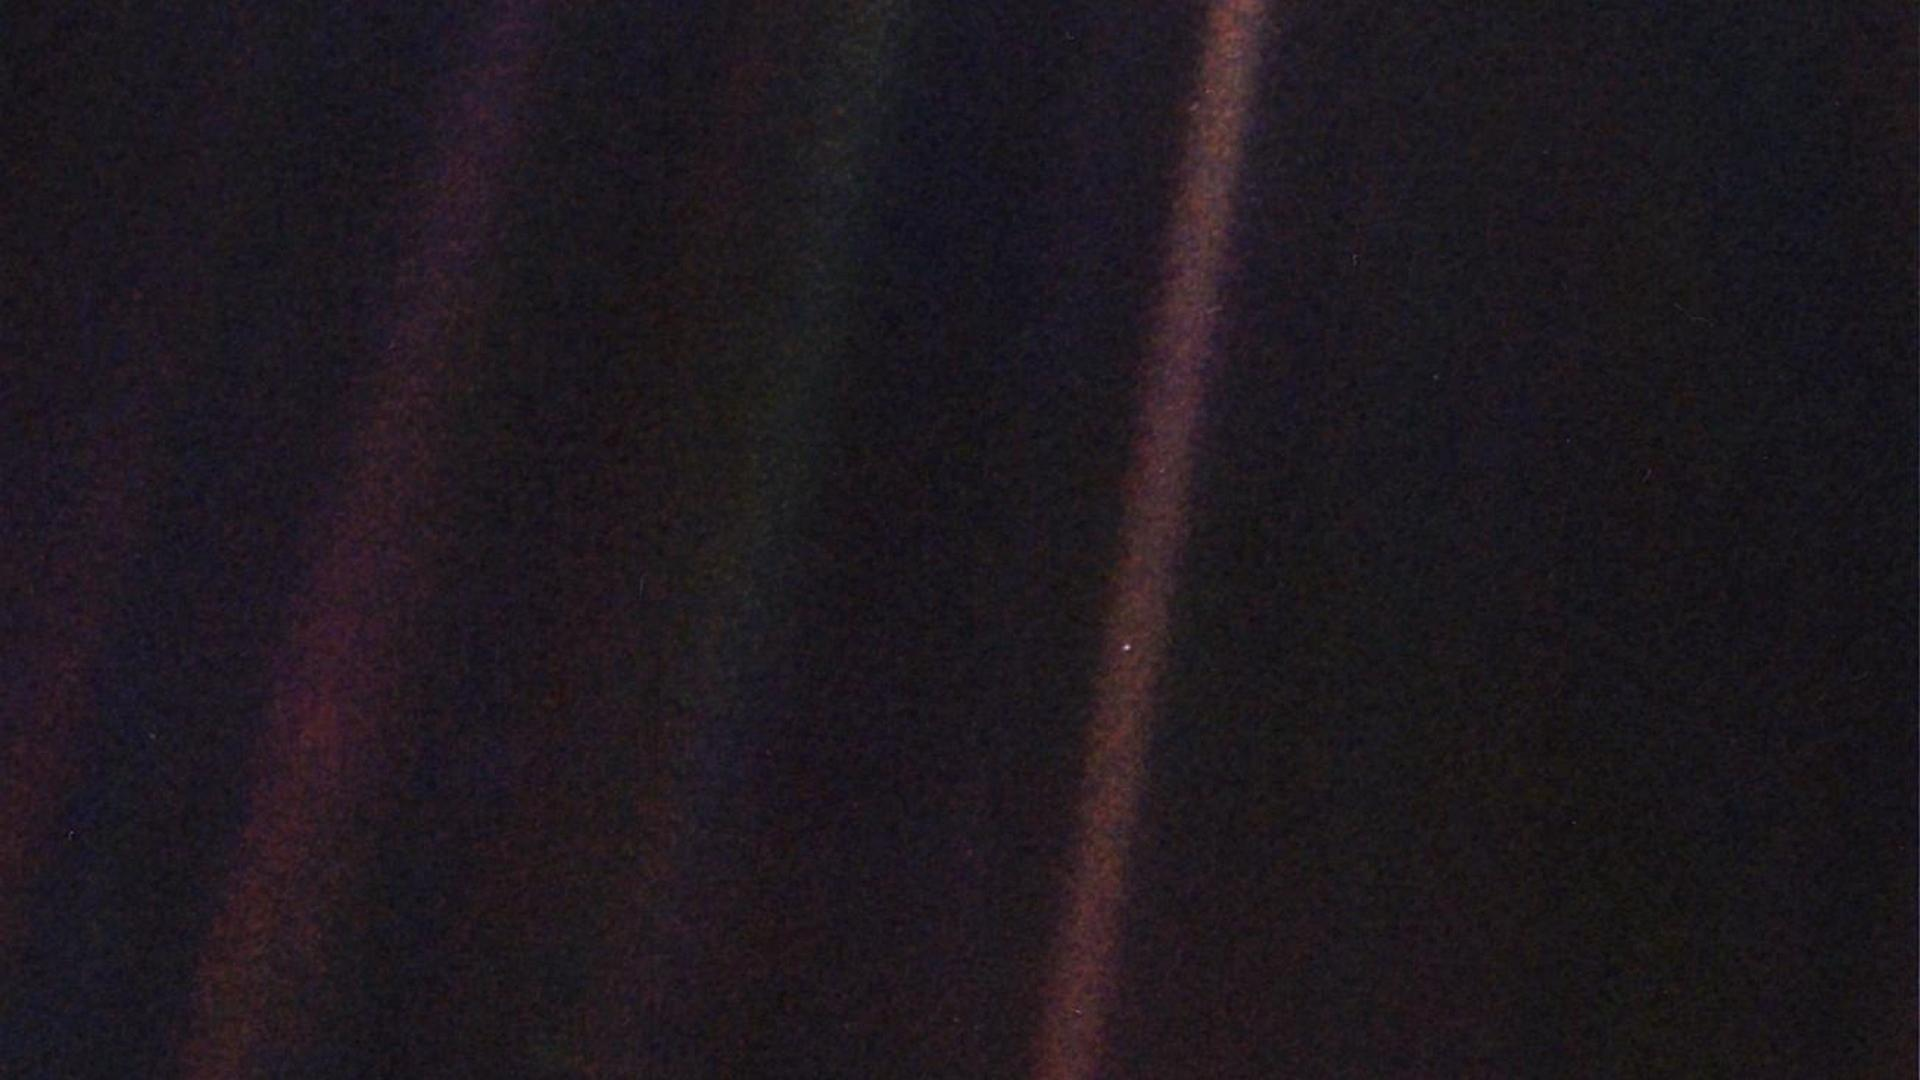 Divulgação/Nasa, JPL